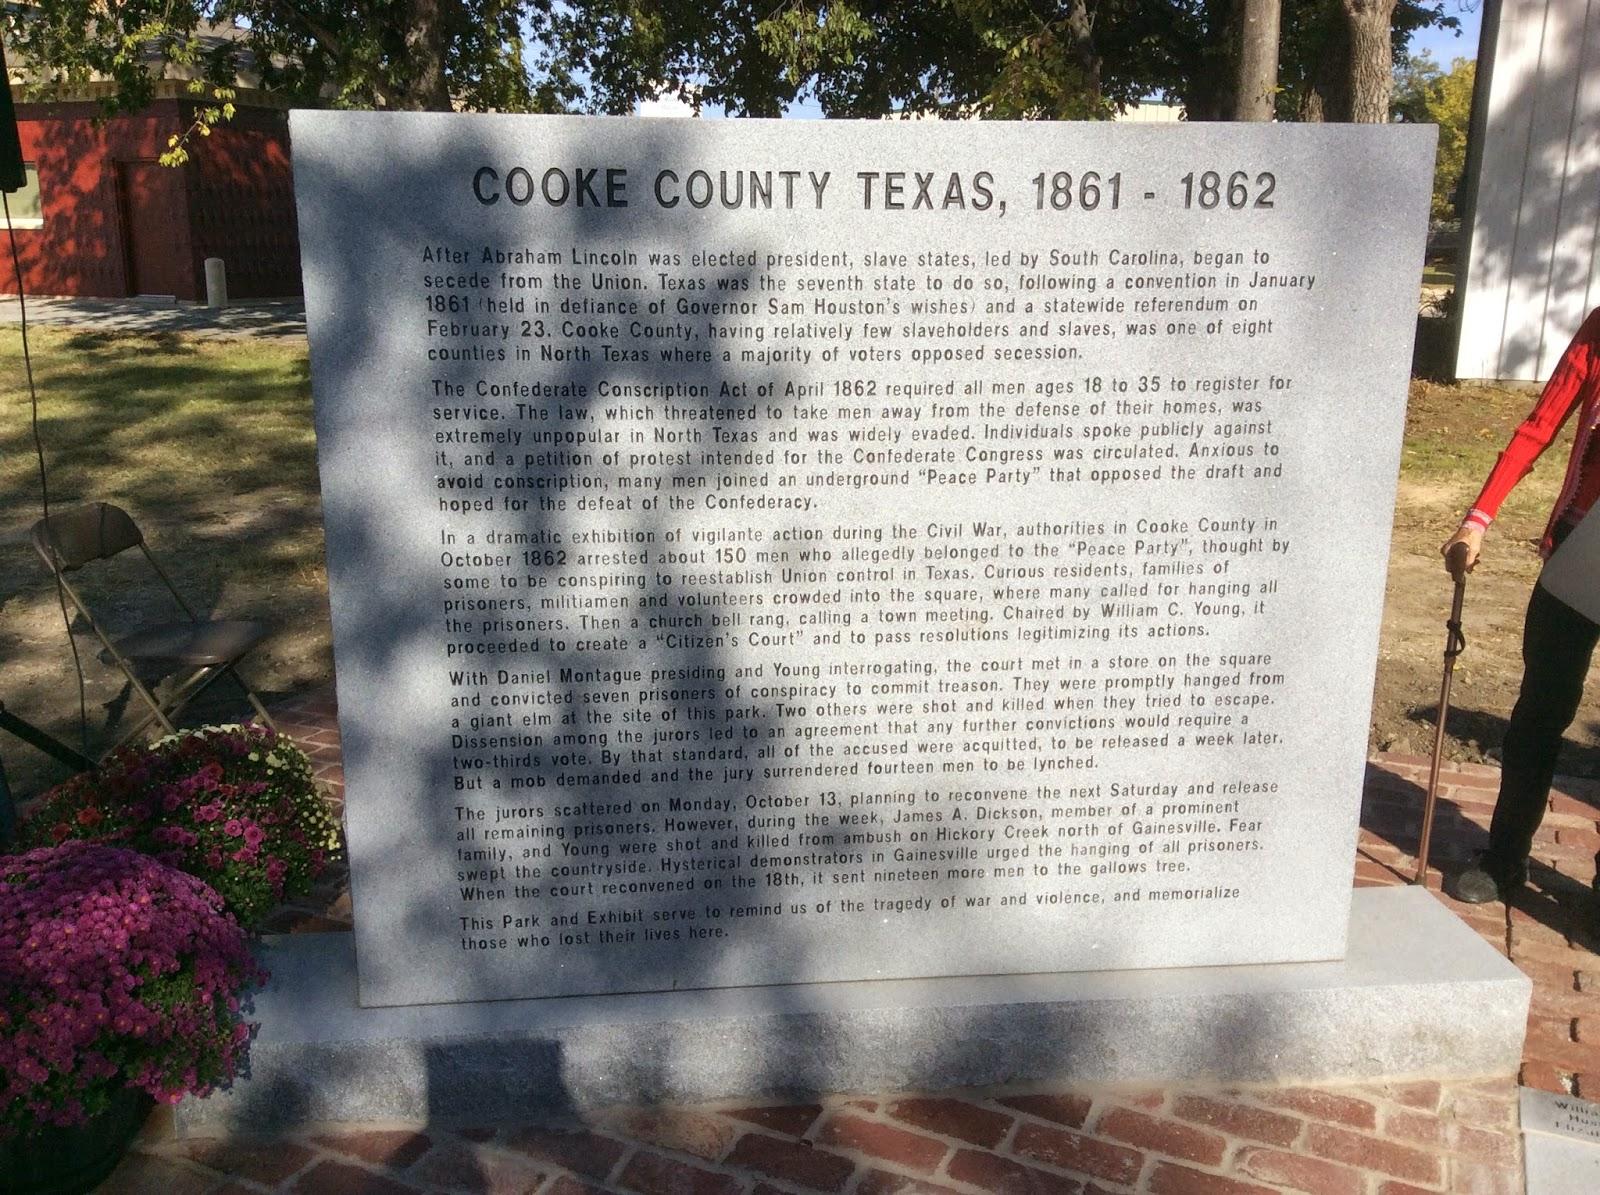 Gainesville, Texas 1862